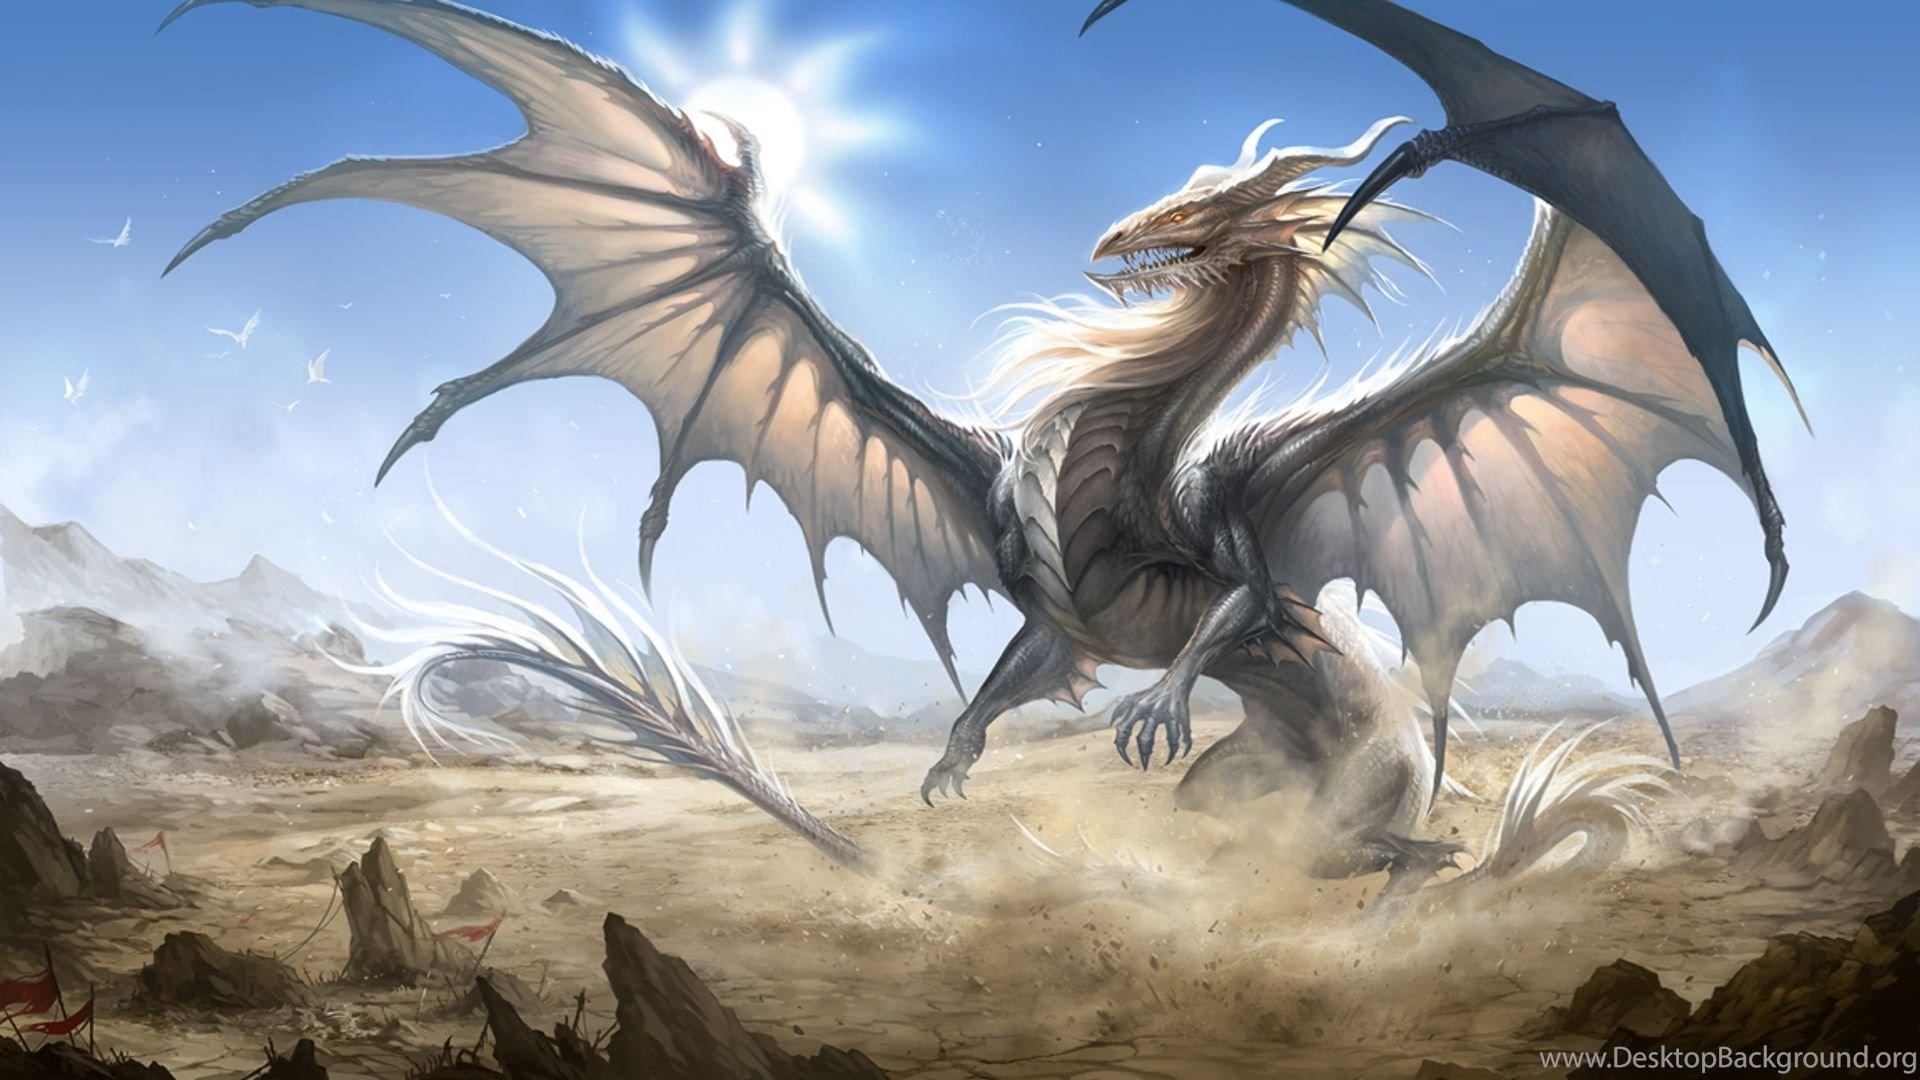 Fonds D Ecran Dragon Tous Les Wallpapers Dragon Desktop Background